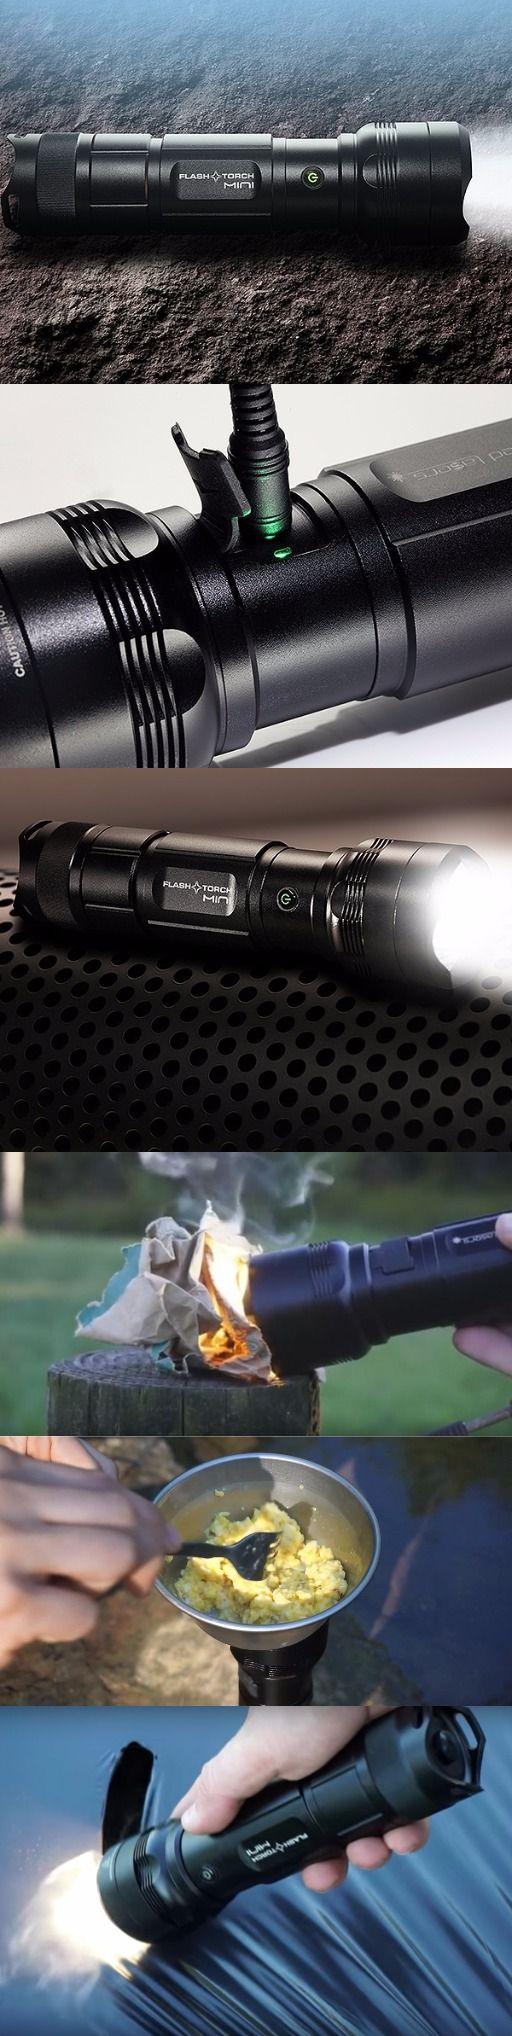 World's Strongest 2400 Lumen Wicked Laser Flash Torch Mini EDC Survival Tactical Flashlight